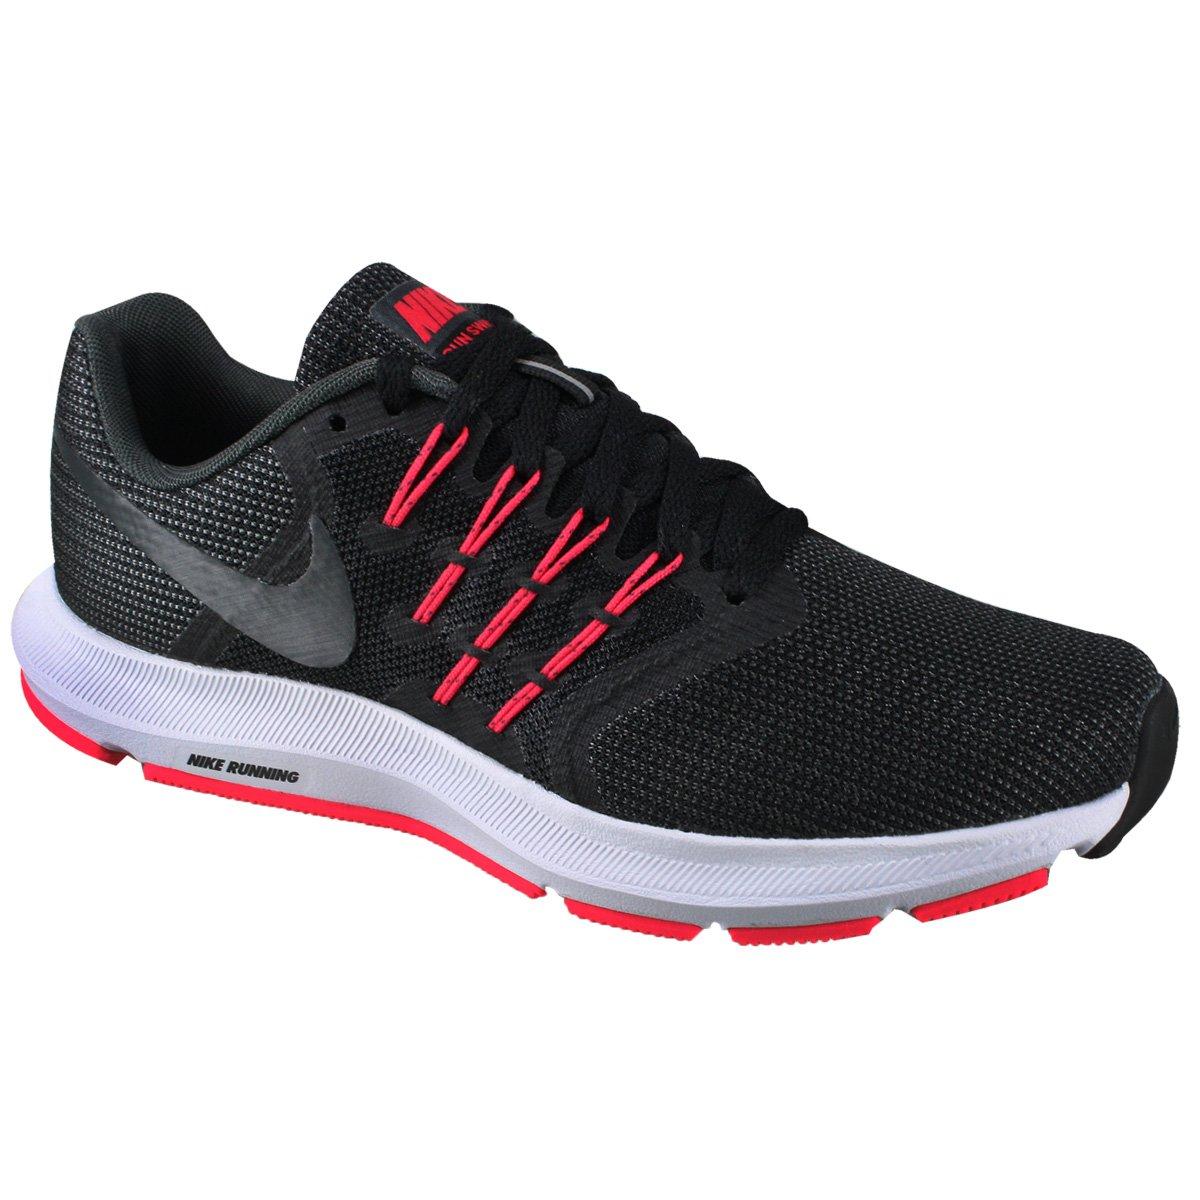 3868b03a262e1 Tênis Nike Run Swift Feminino 909006-006 - Preto Cinza Vermelho ...